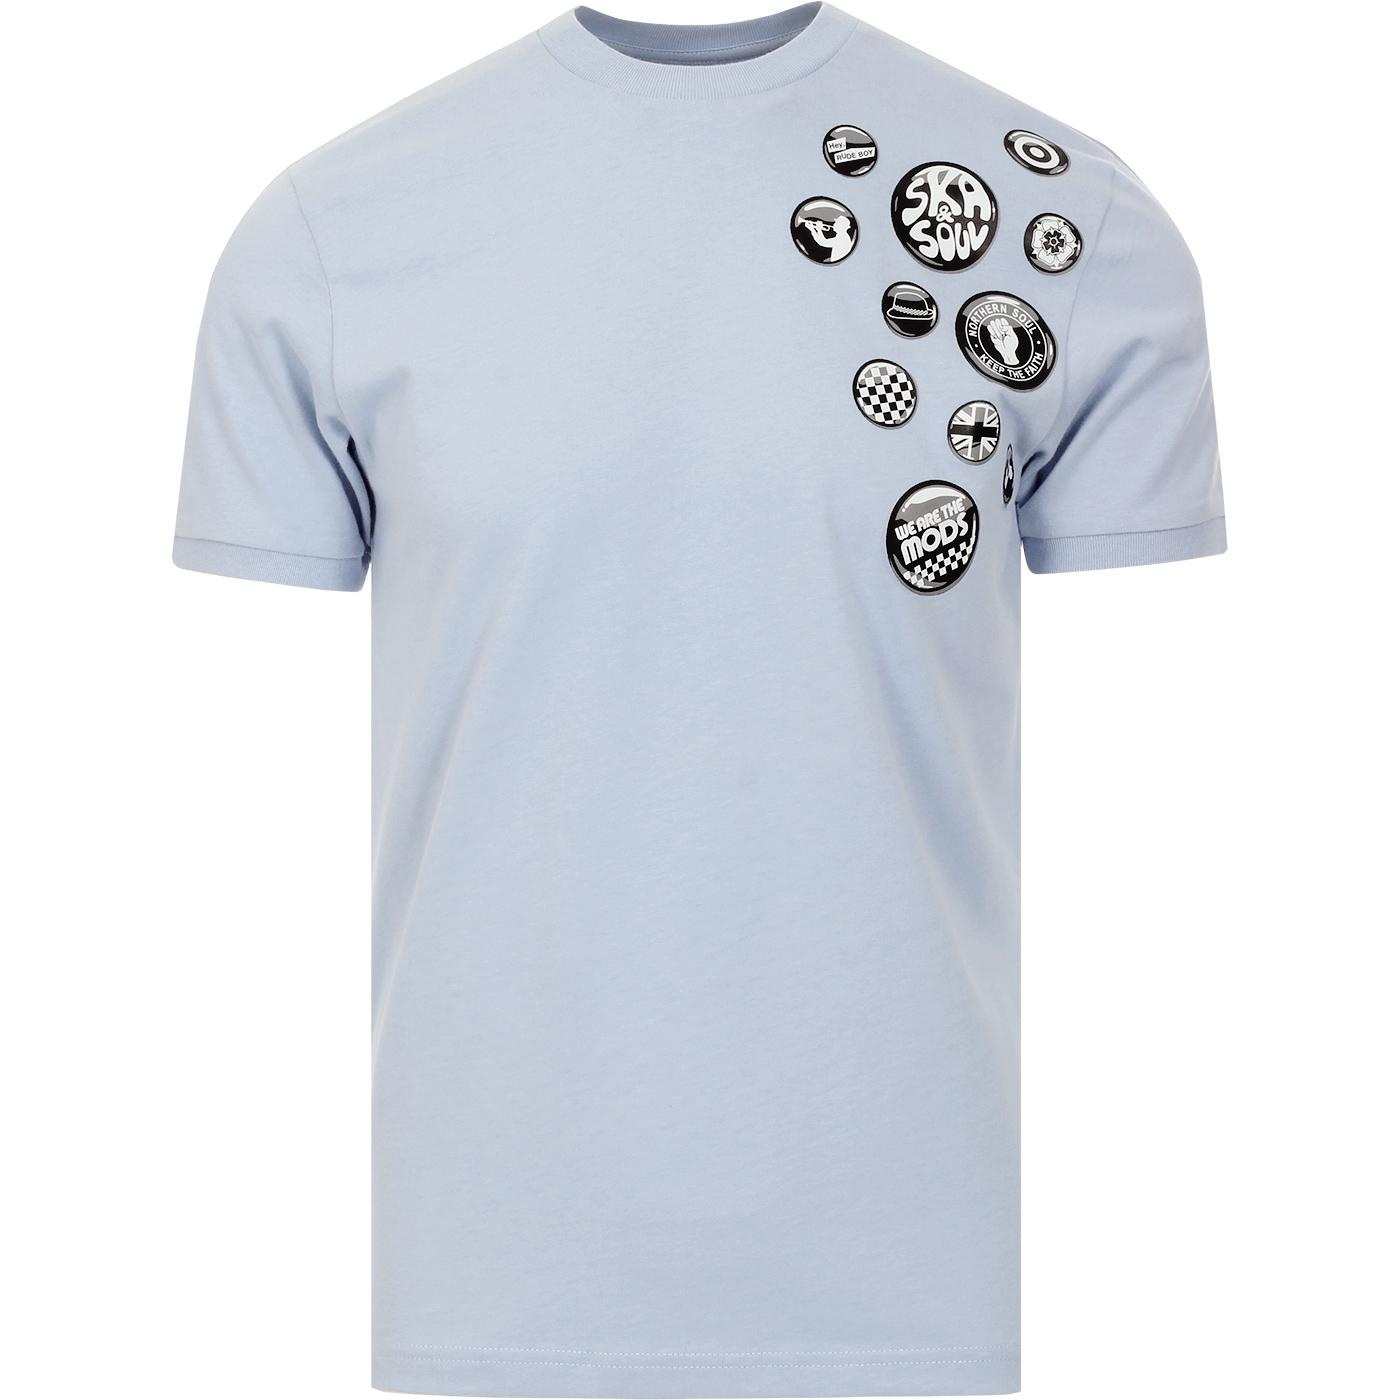 SKA & SOUL Retro Mod Badge Print T-shirt (Sky)